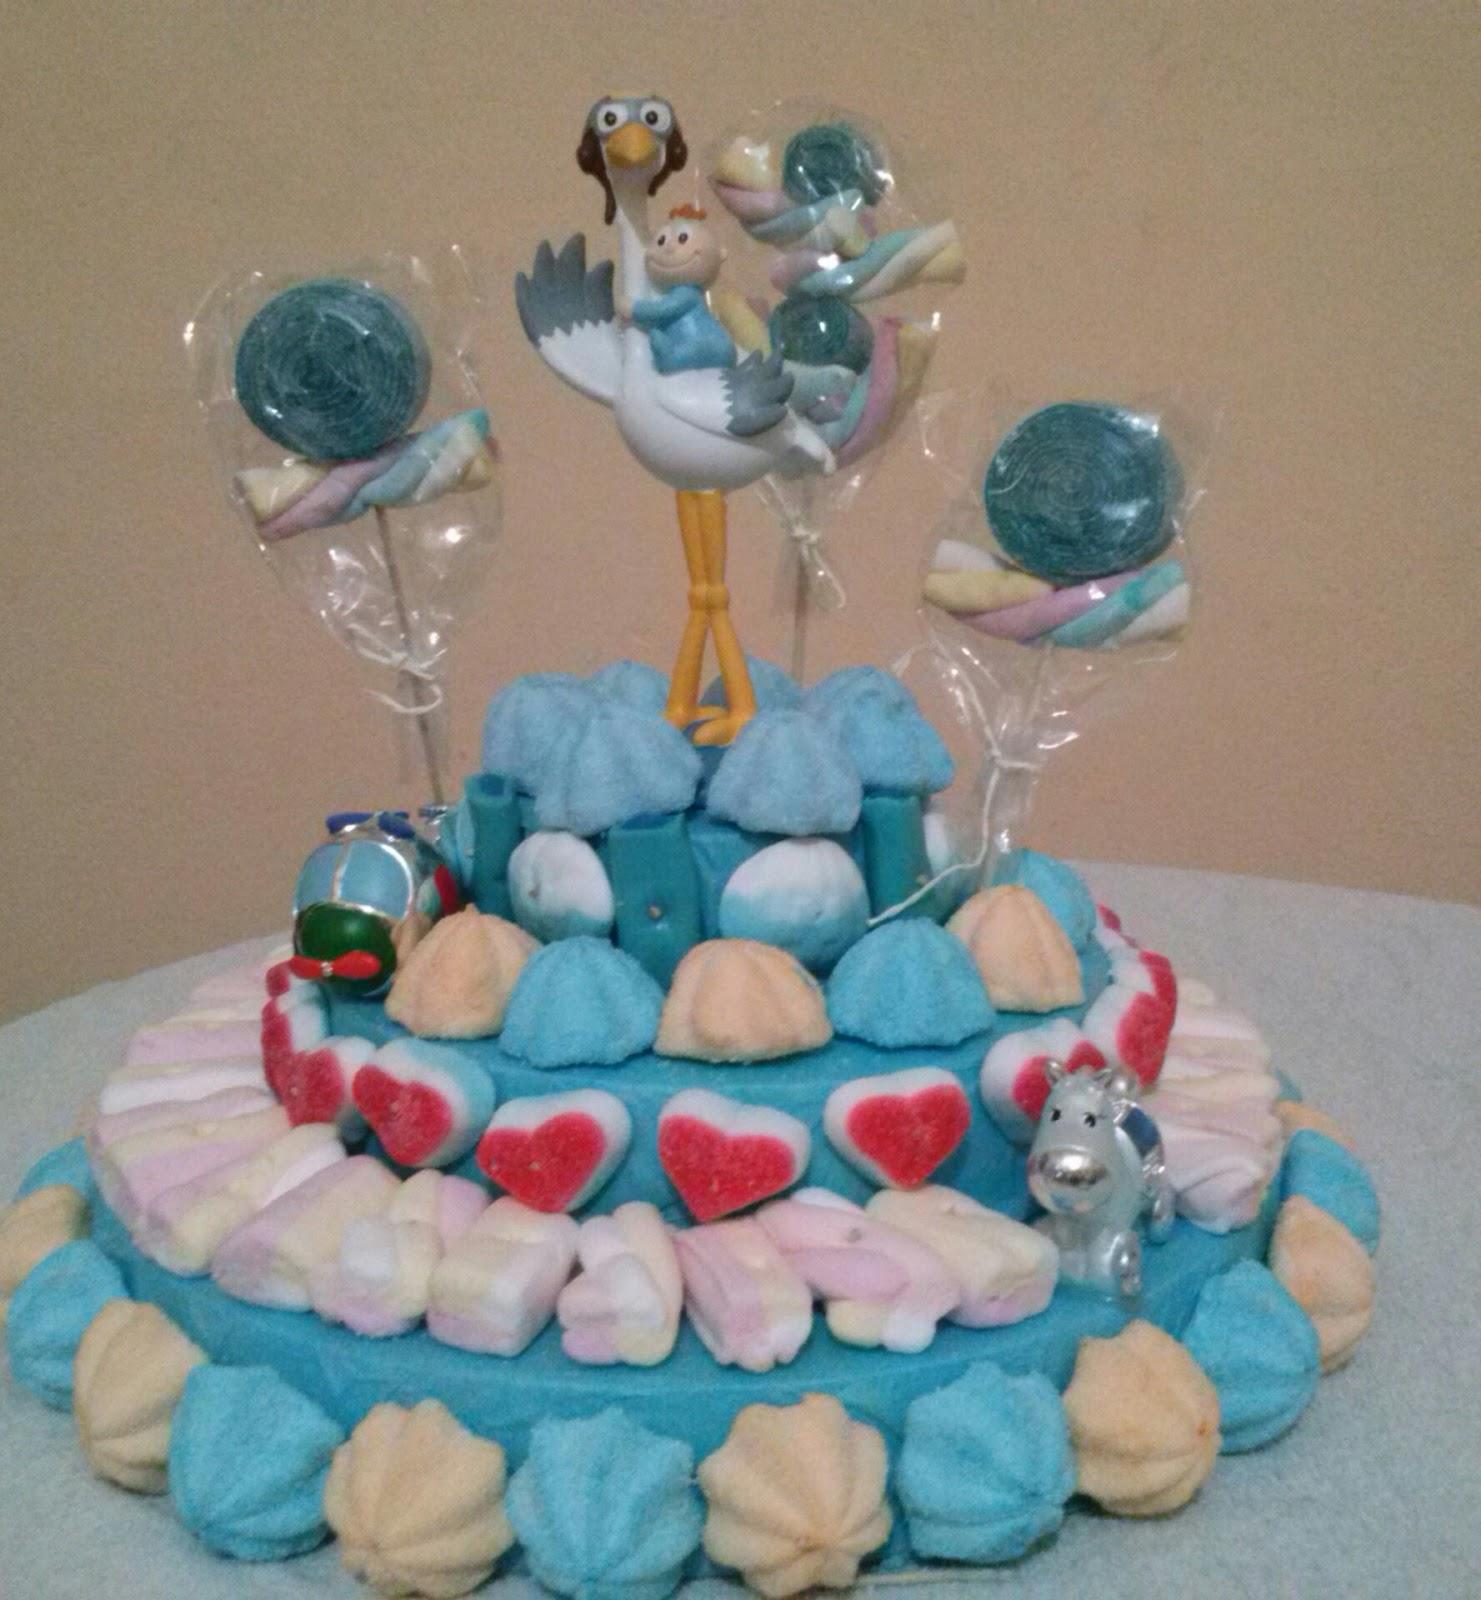 El rinc n cartame o de ana tarta de chuches para bautizo - Mesa de chuches para bautizo ...